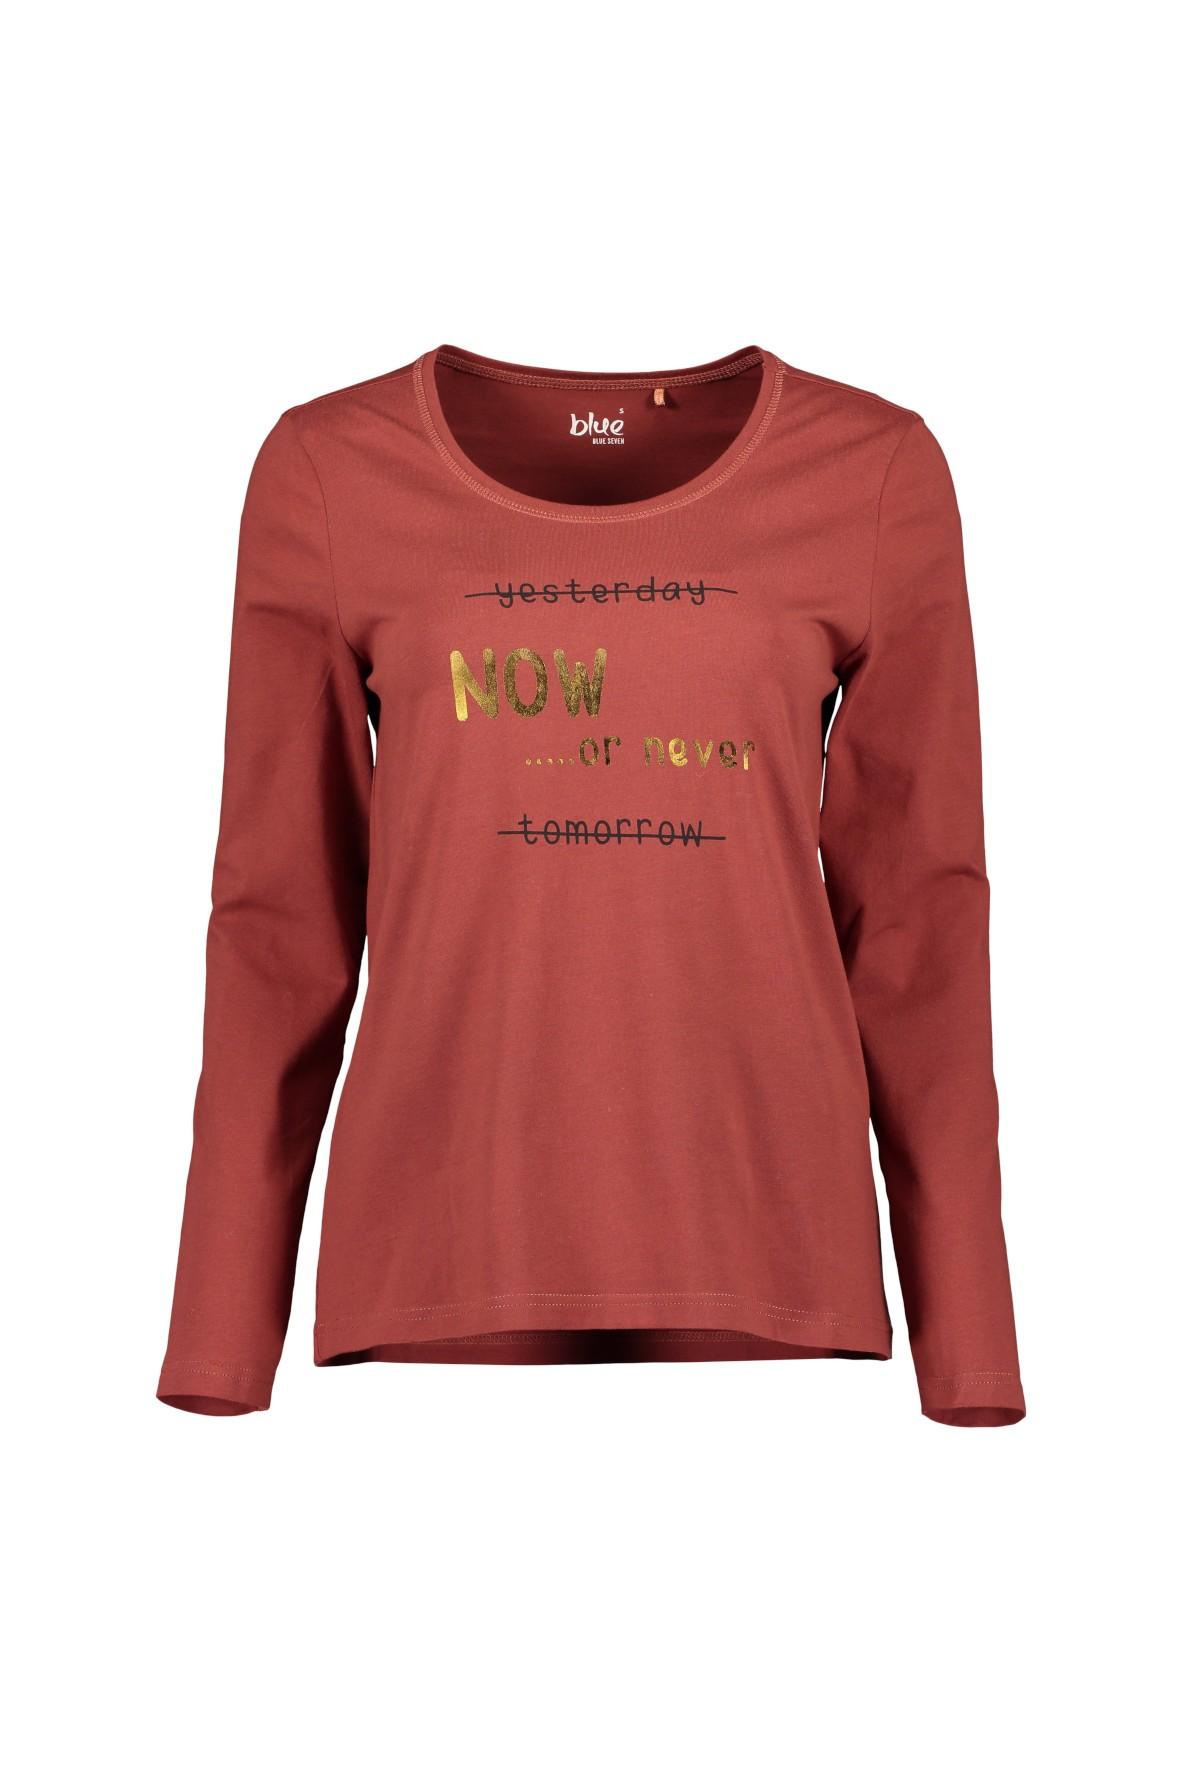 Dzianinowa koszulka damska z nadrukiem - bordowa